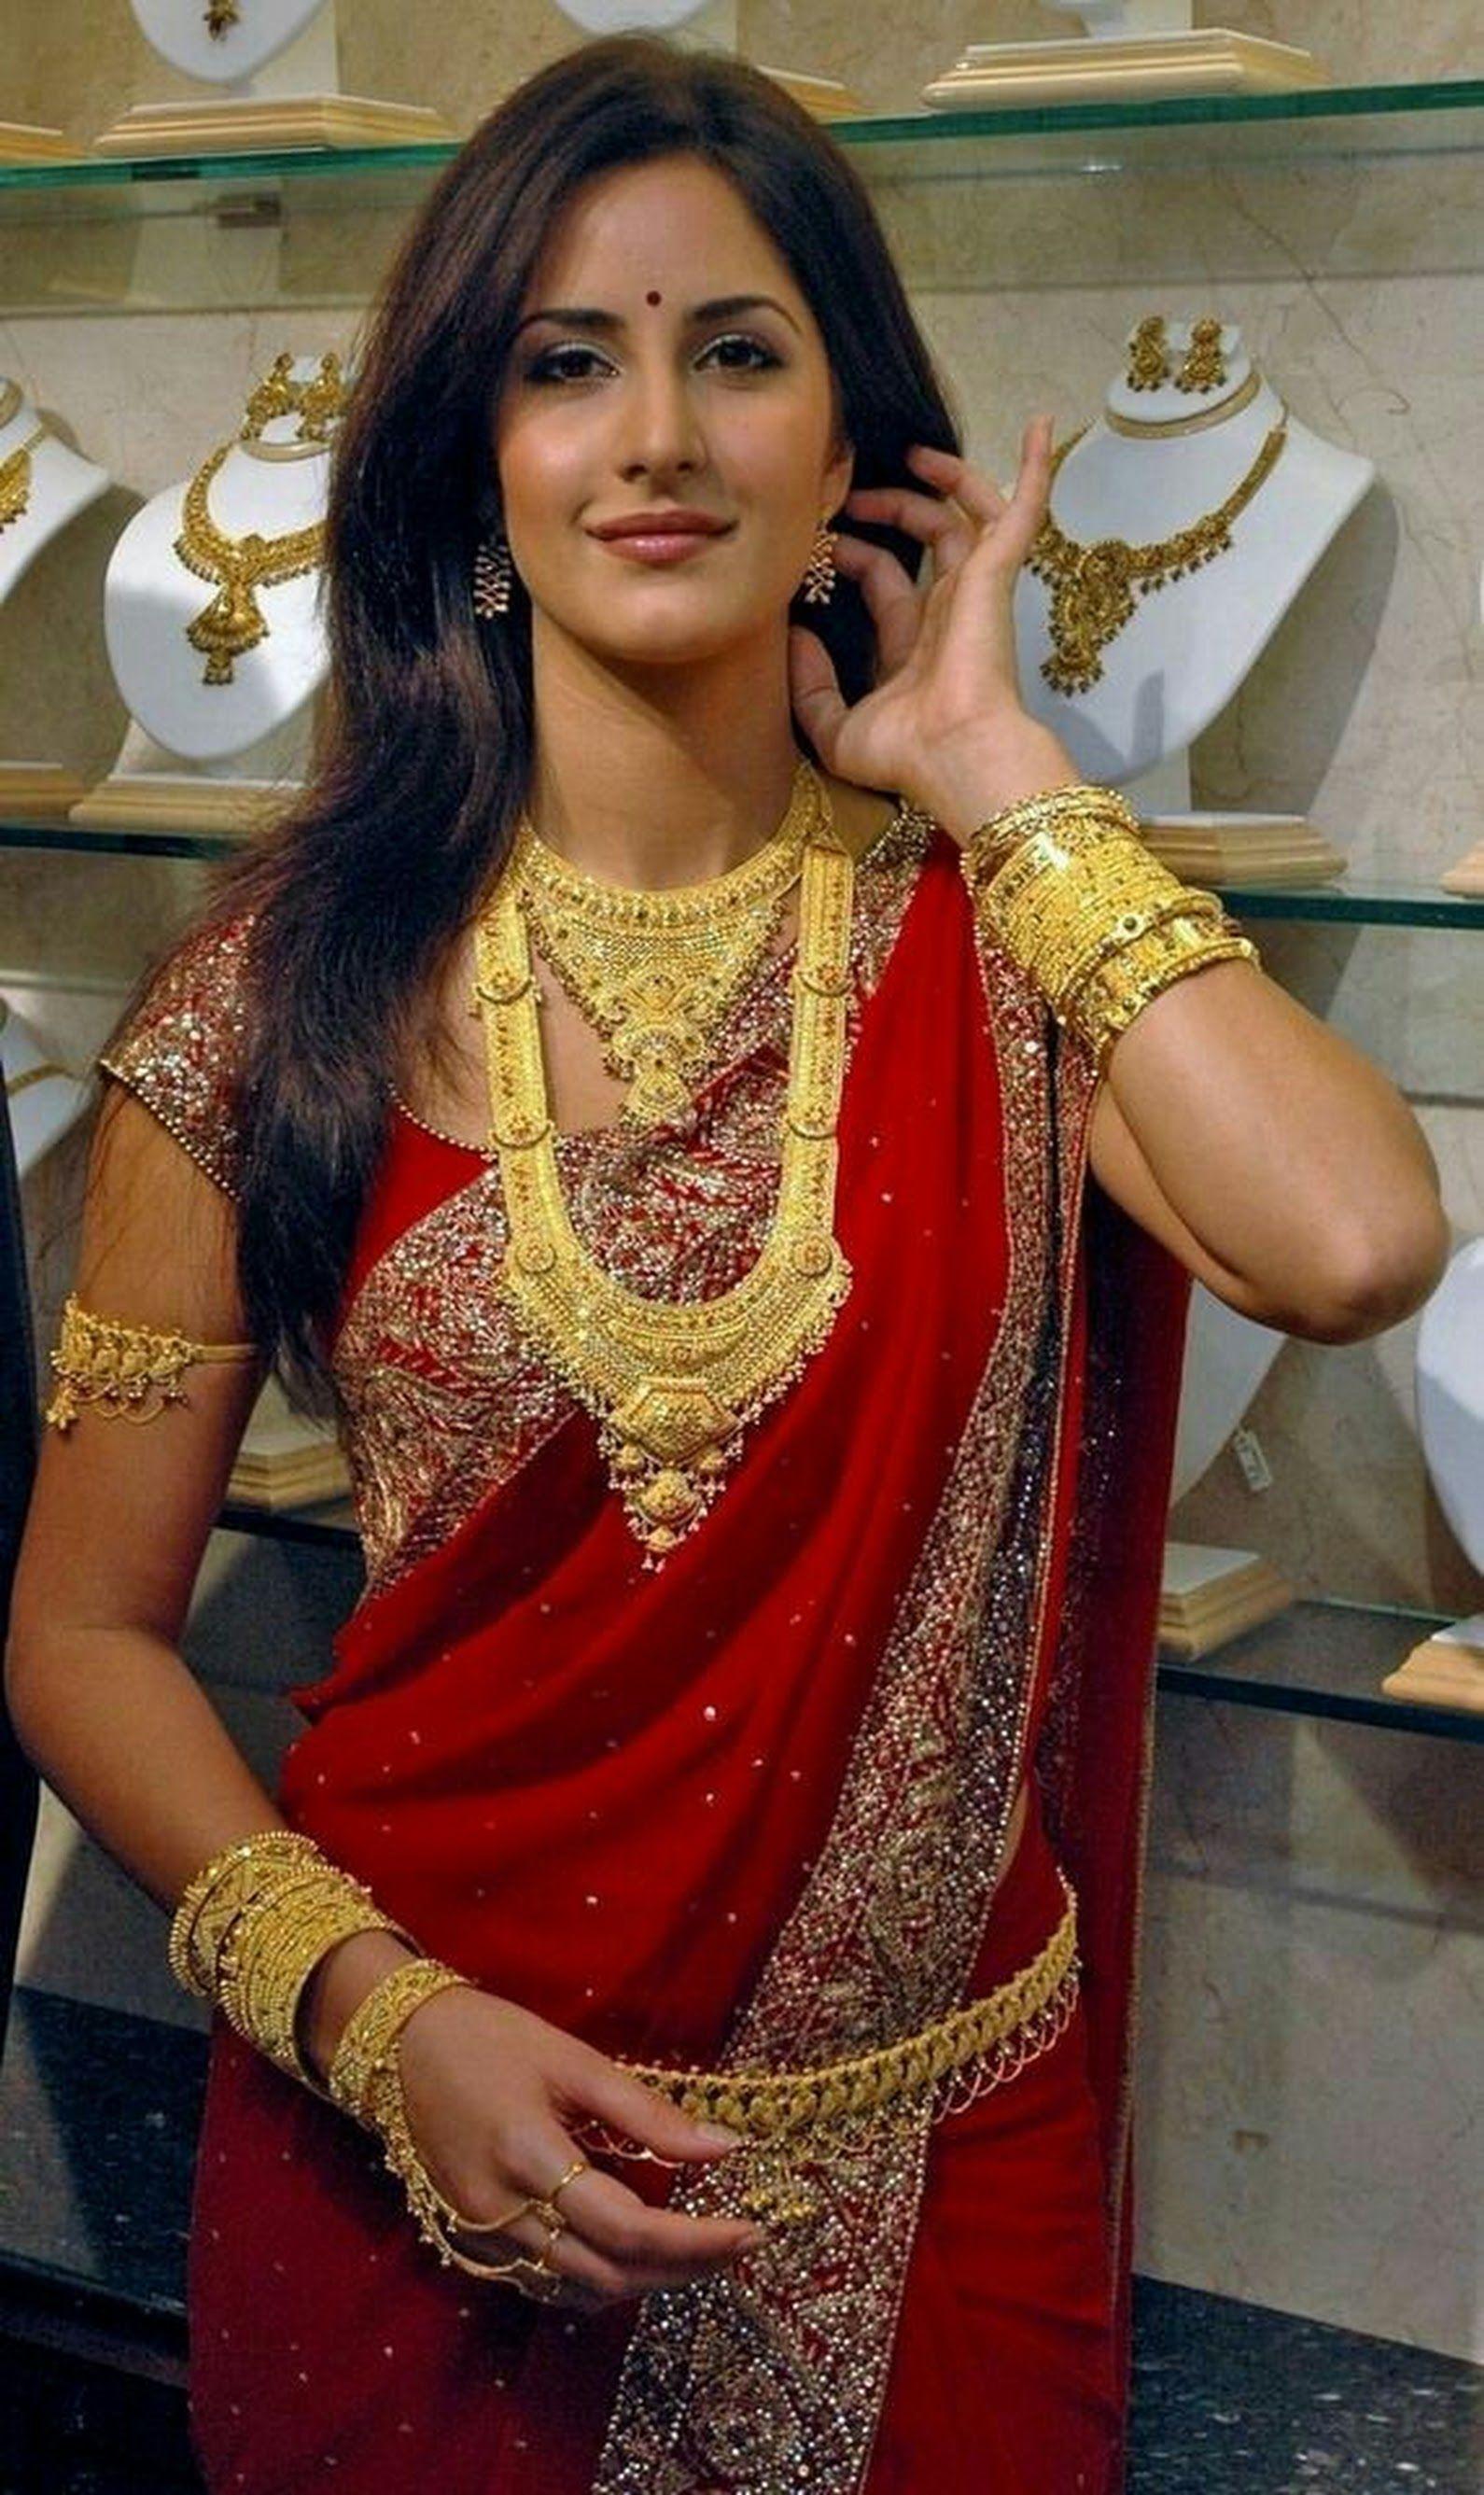 Goddess Of Wealth And Prosperity  Devi Katrina Kaif